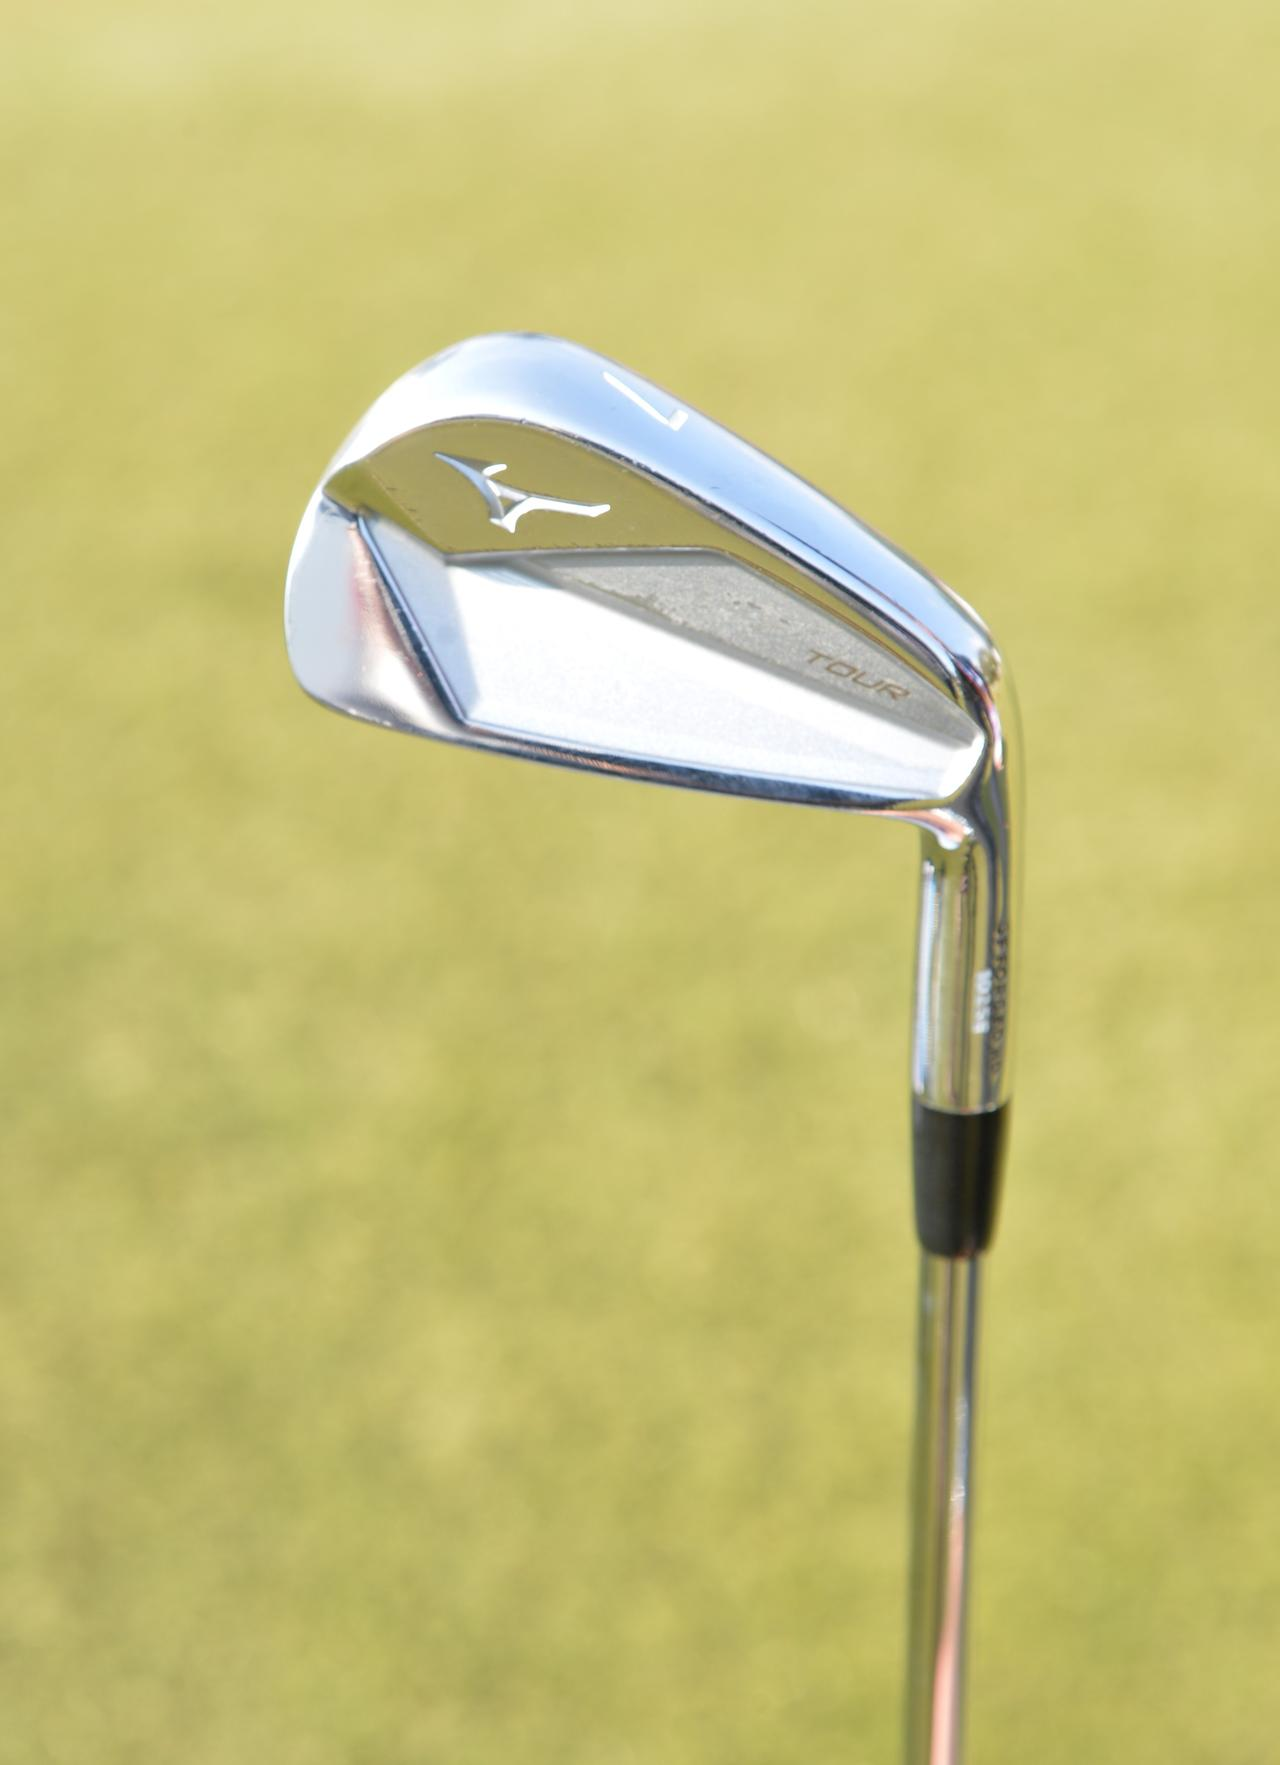 Images : 4番目の画像 - イ・ミニョンの14本 - みんなのゴルフダイジェスト